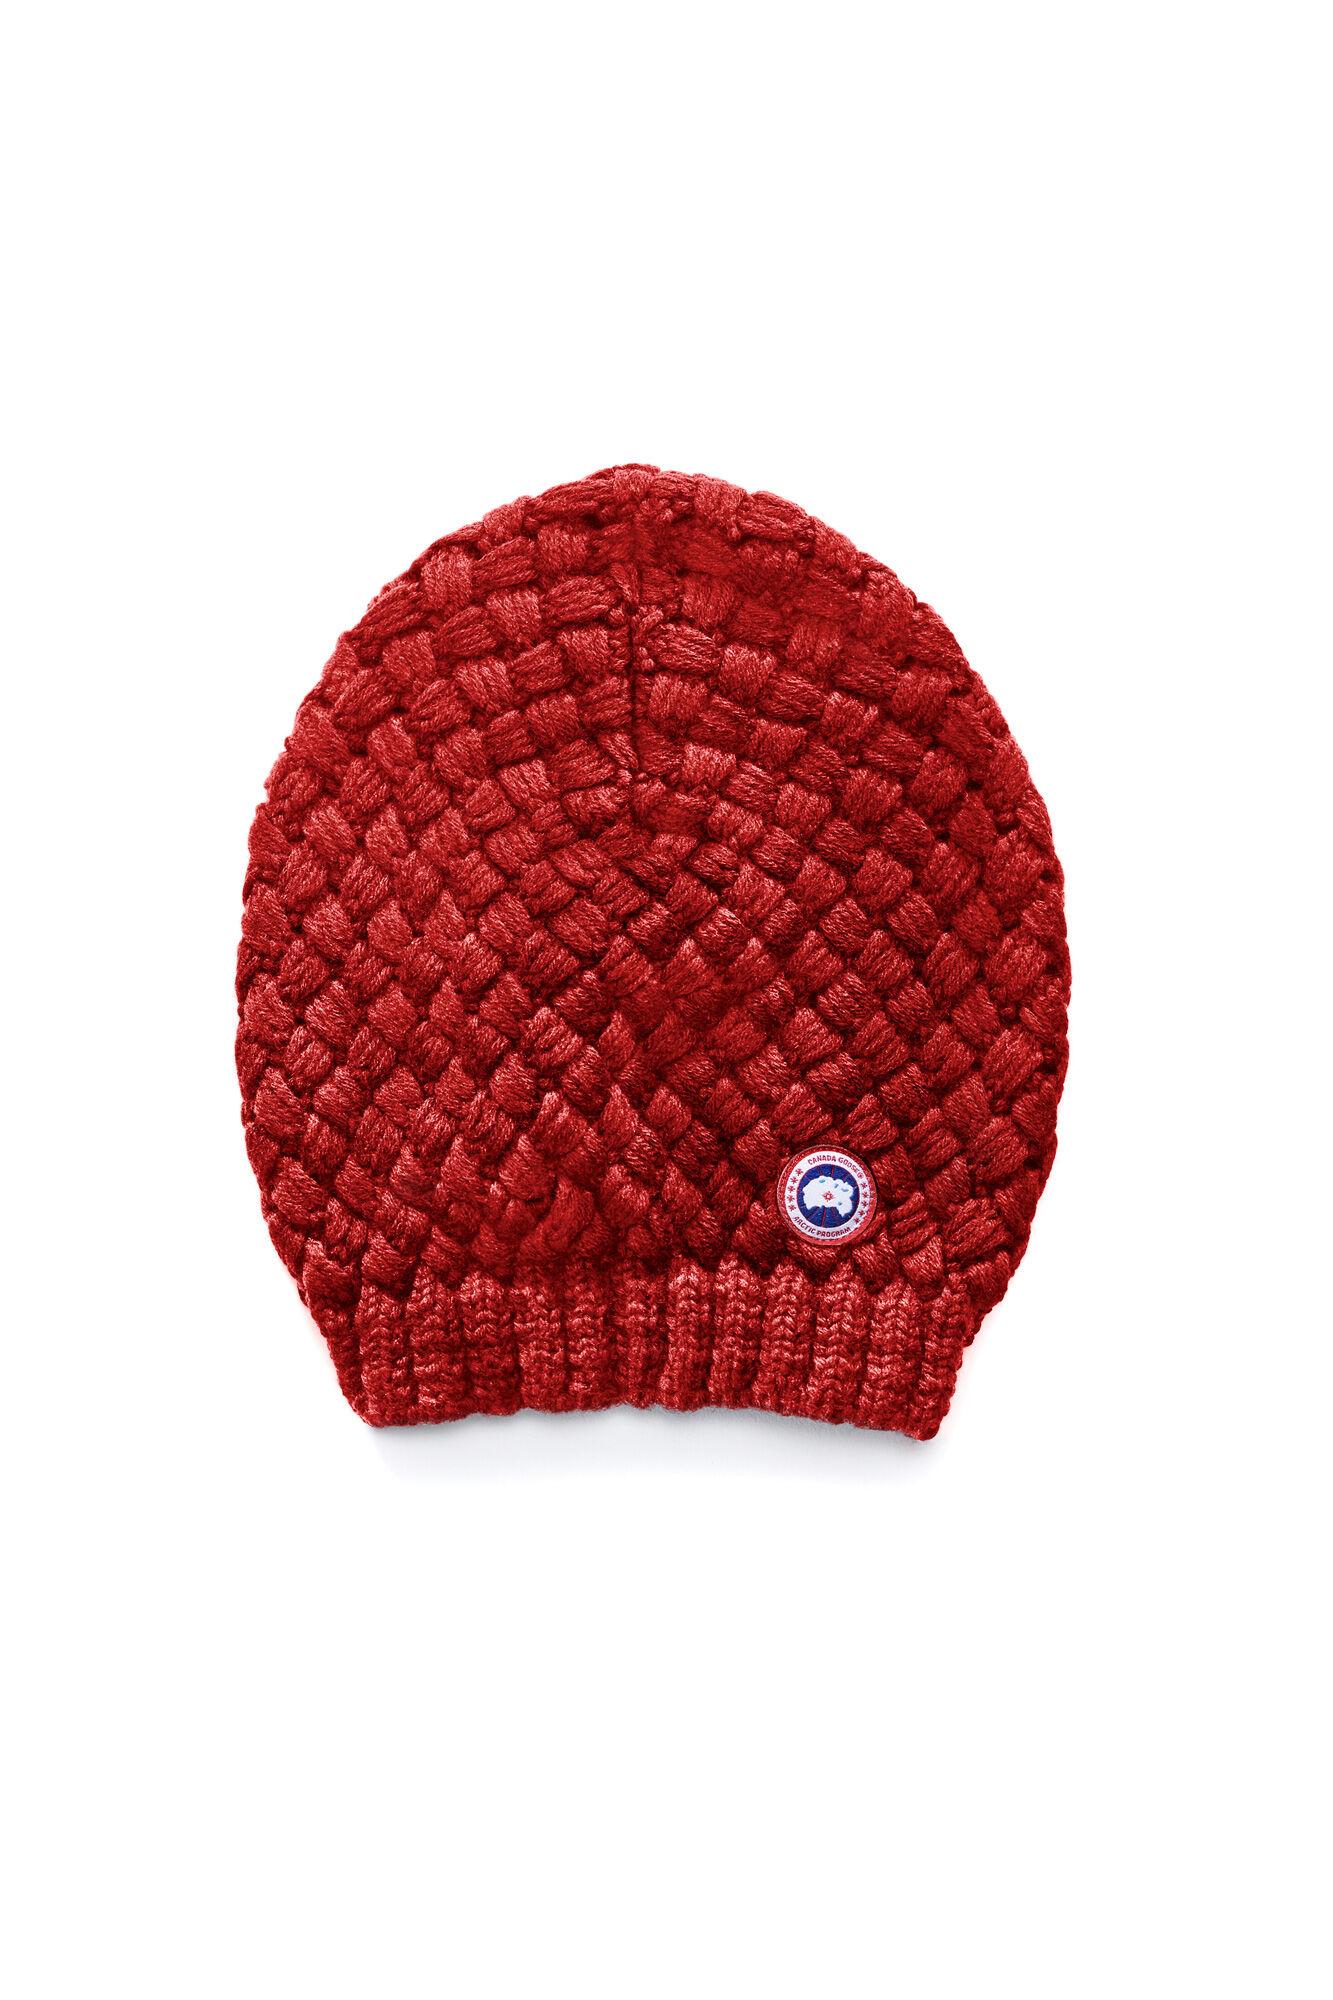 Canada Goose toronto replica official - Basket Weave Slouchy | Canada Goose?